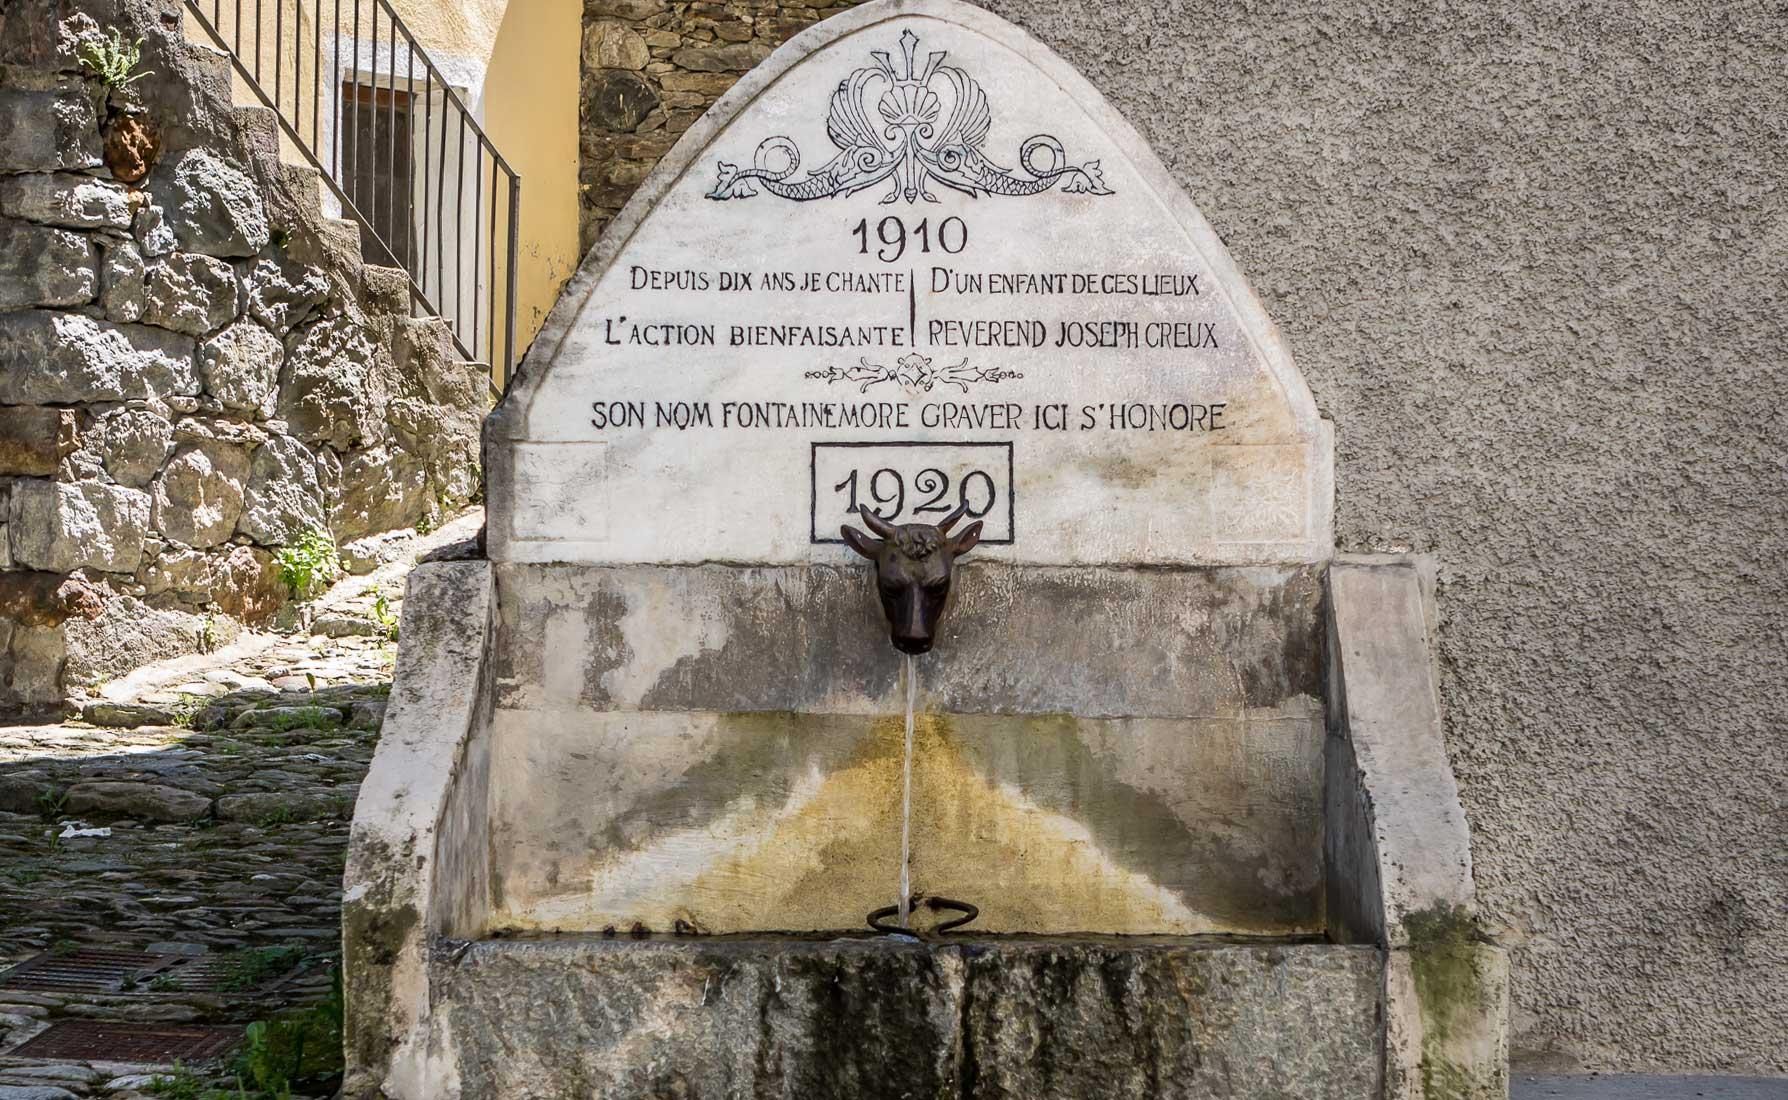 Fontana dedicata al reverendo Joseph Creux,originario di Fontainemore.